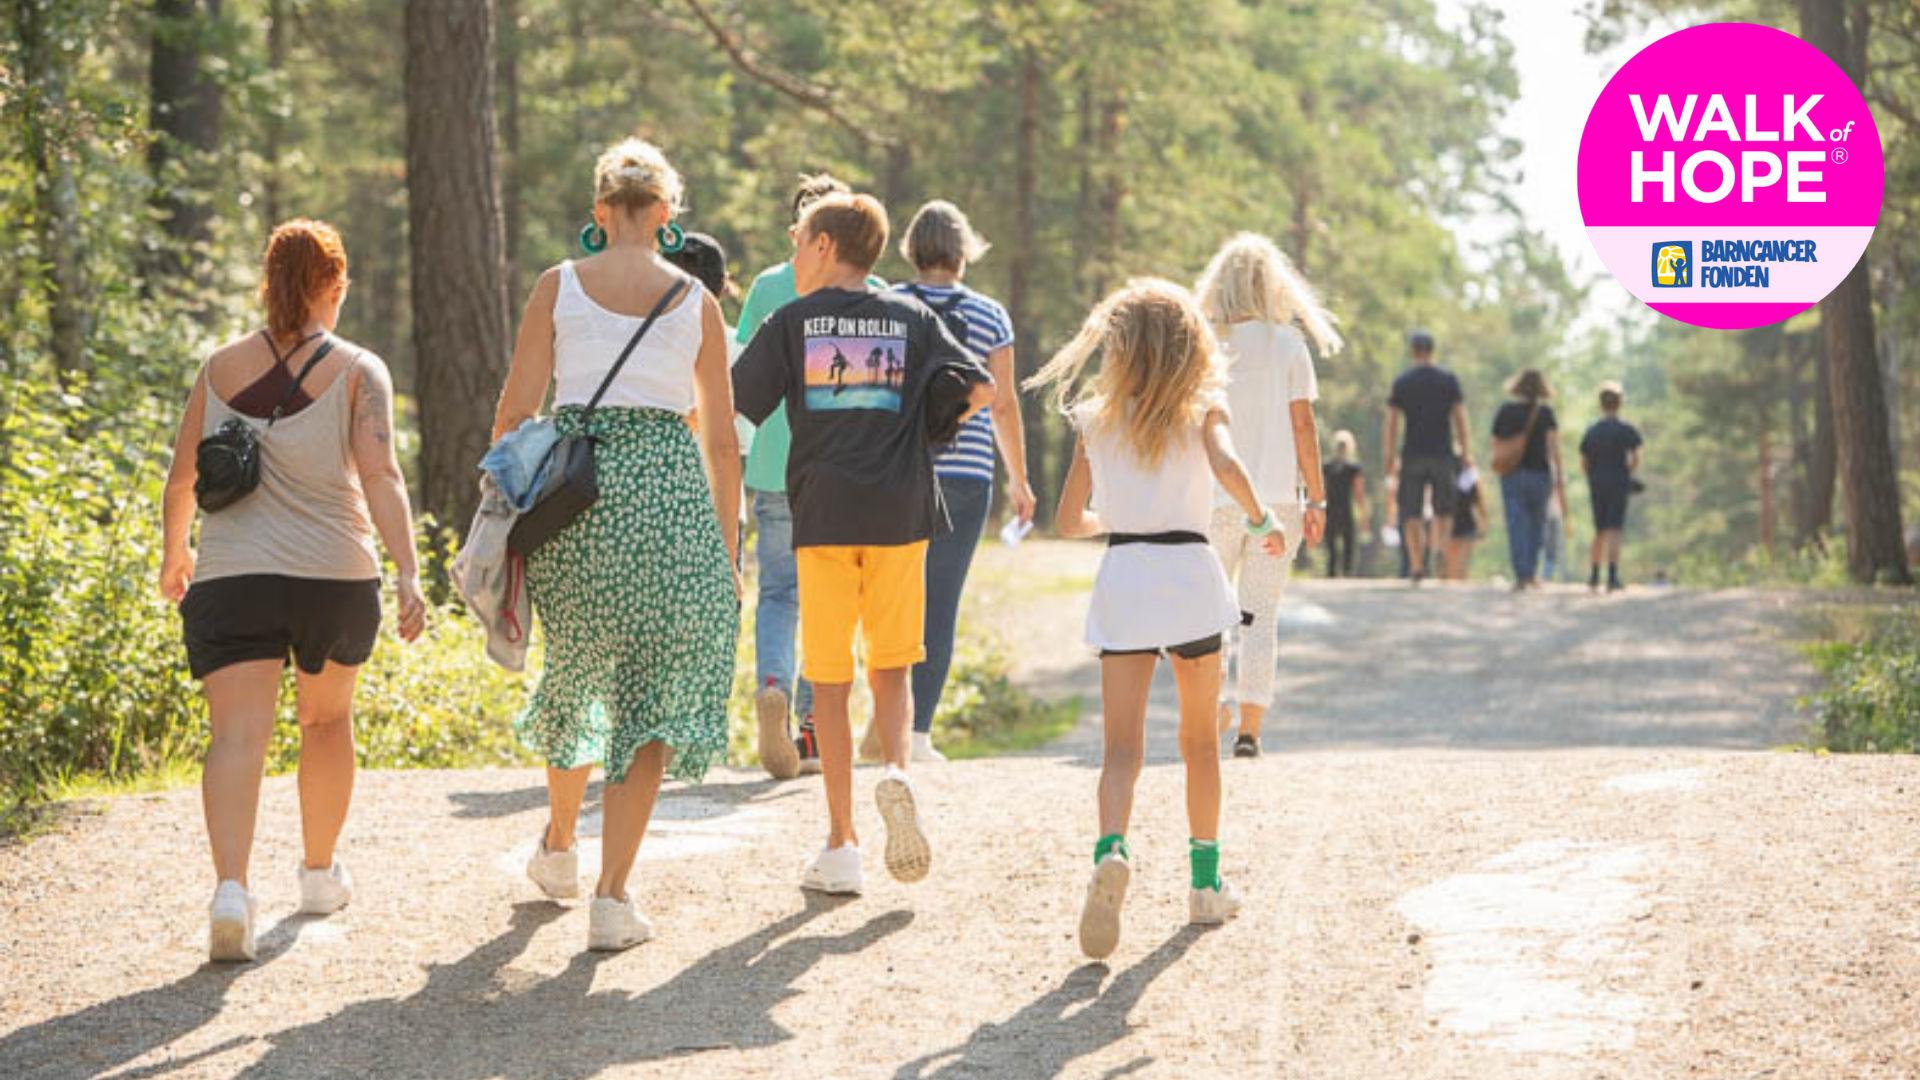 Barncancerfondens virtuella Walk of Hope 2021